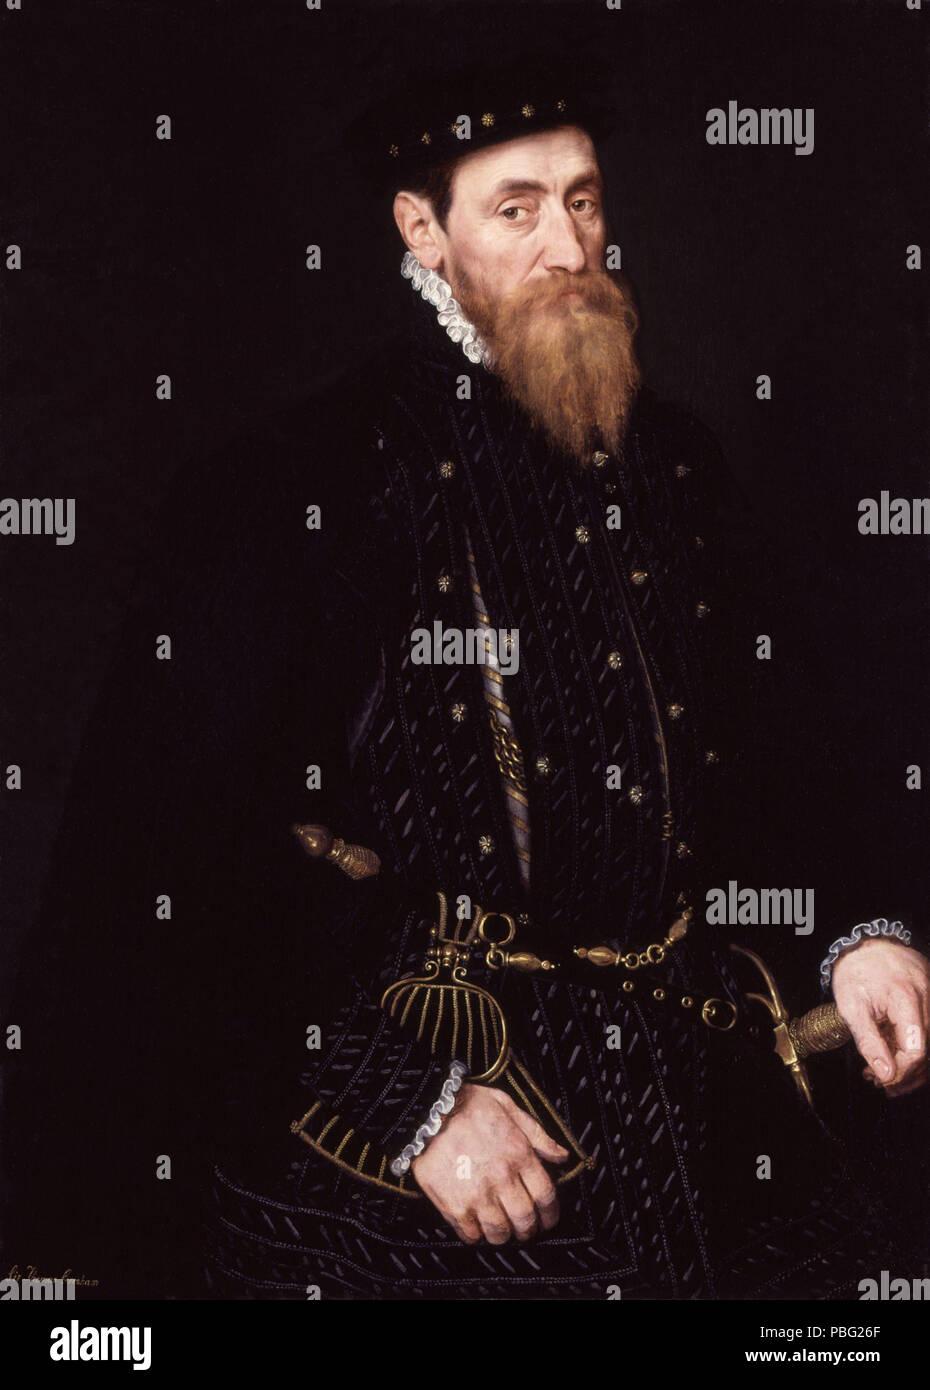 1540 Sir Thomas Gresham from NPG - Stock Image